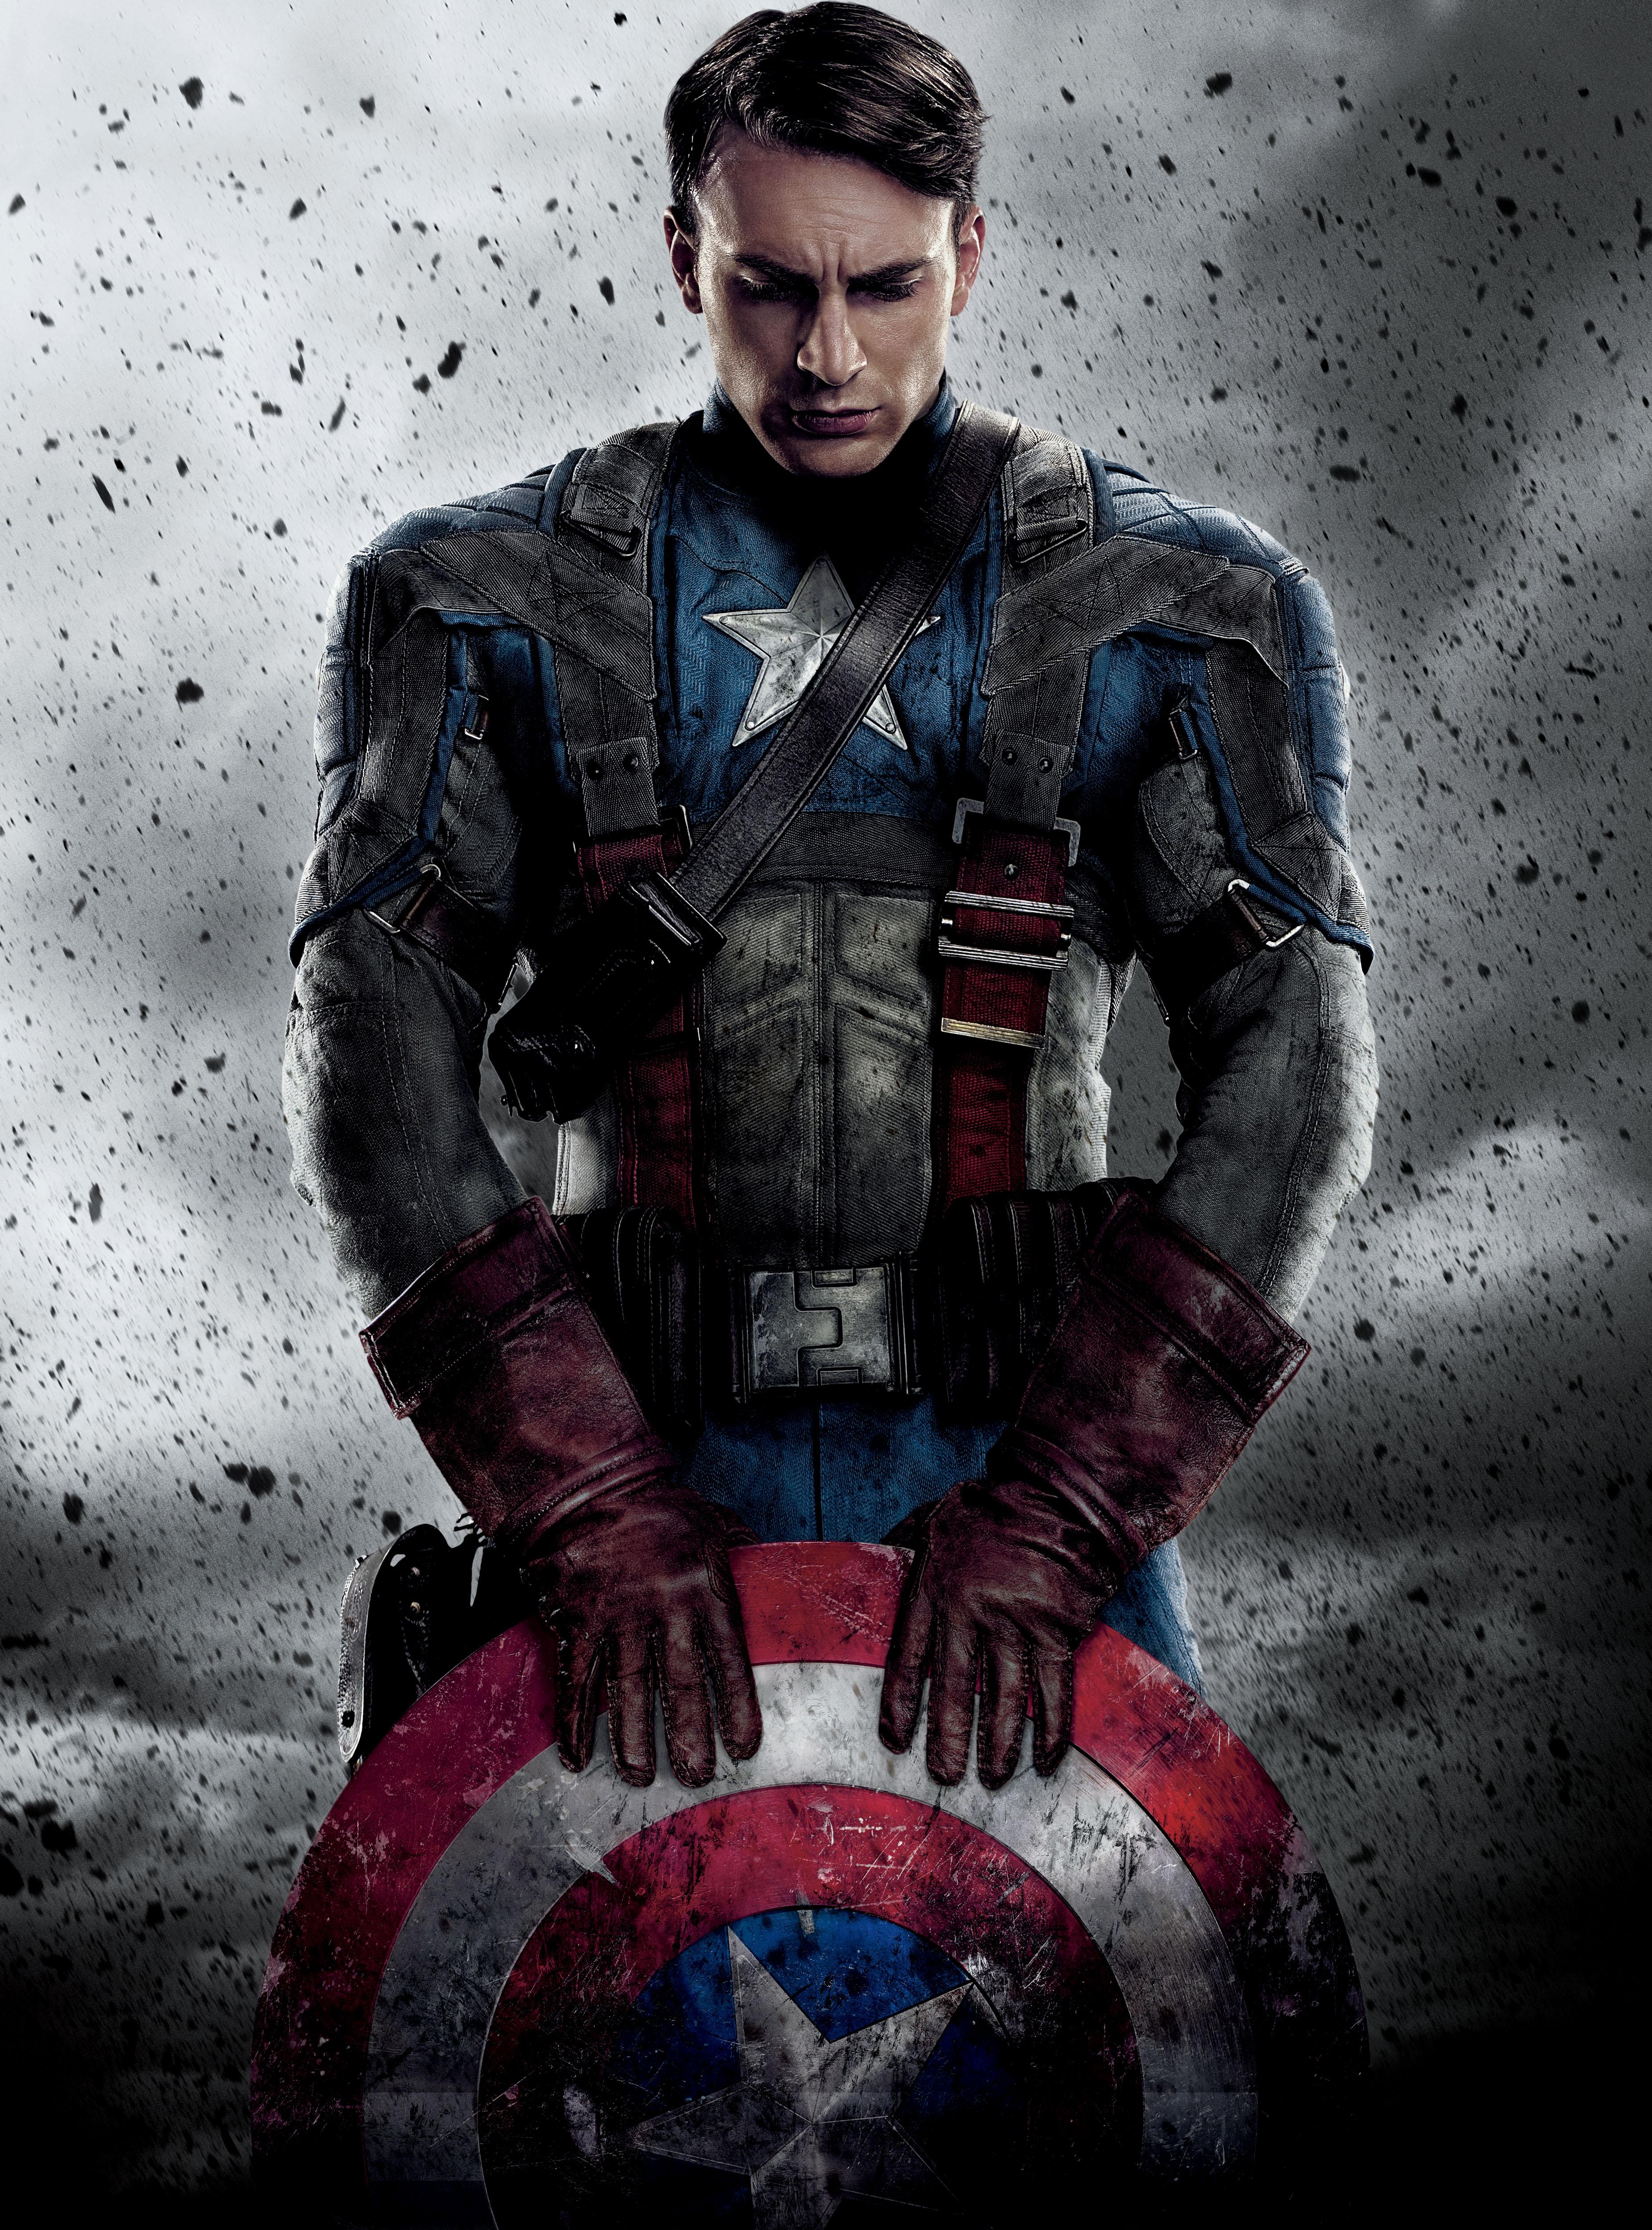 Captain america movie poster myconfinedspace - Image captain america ...